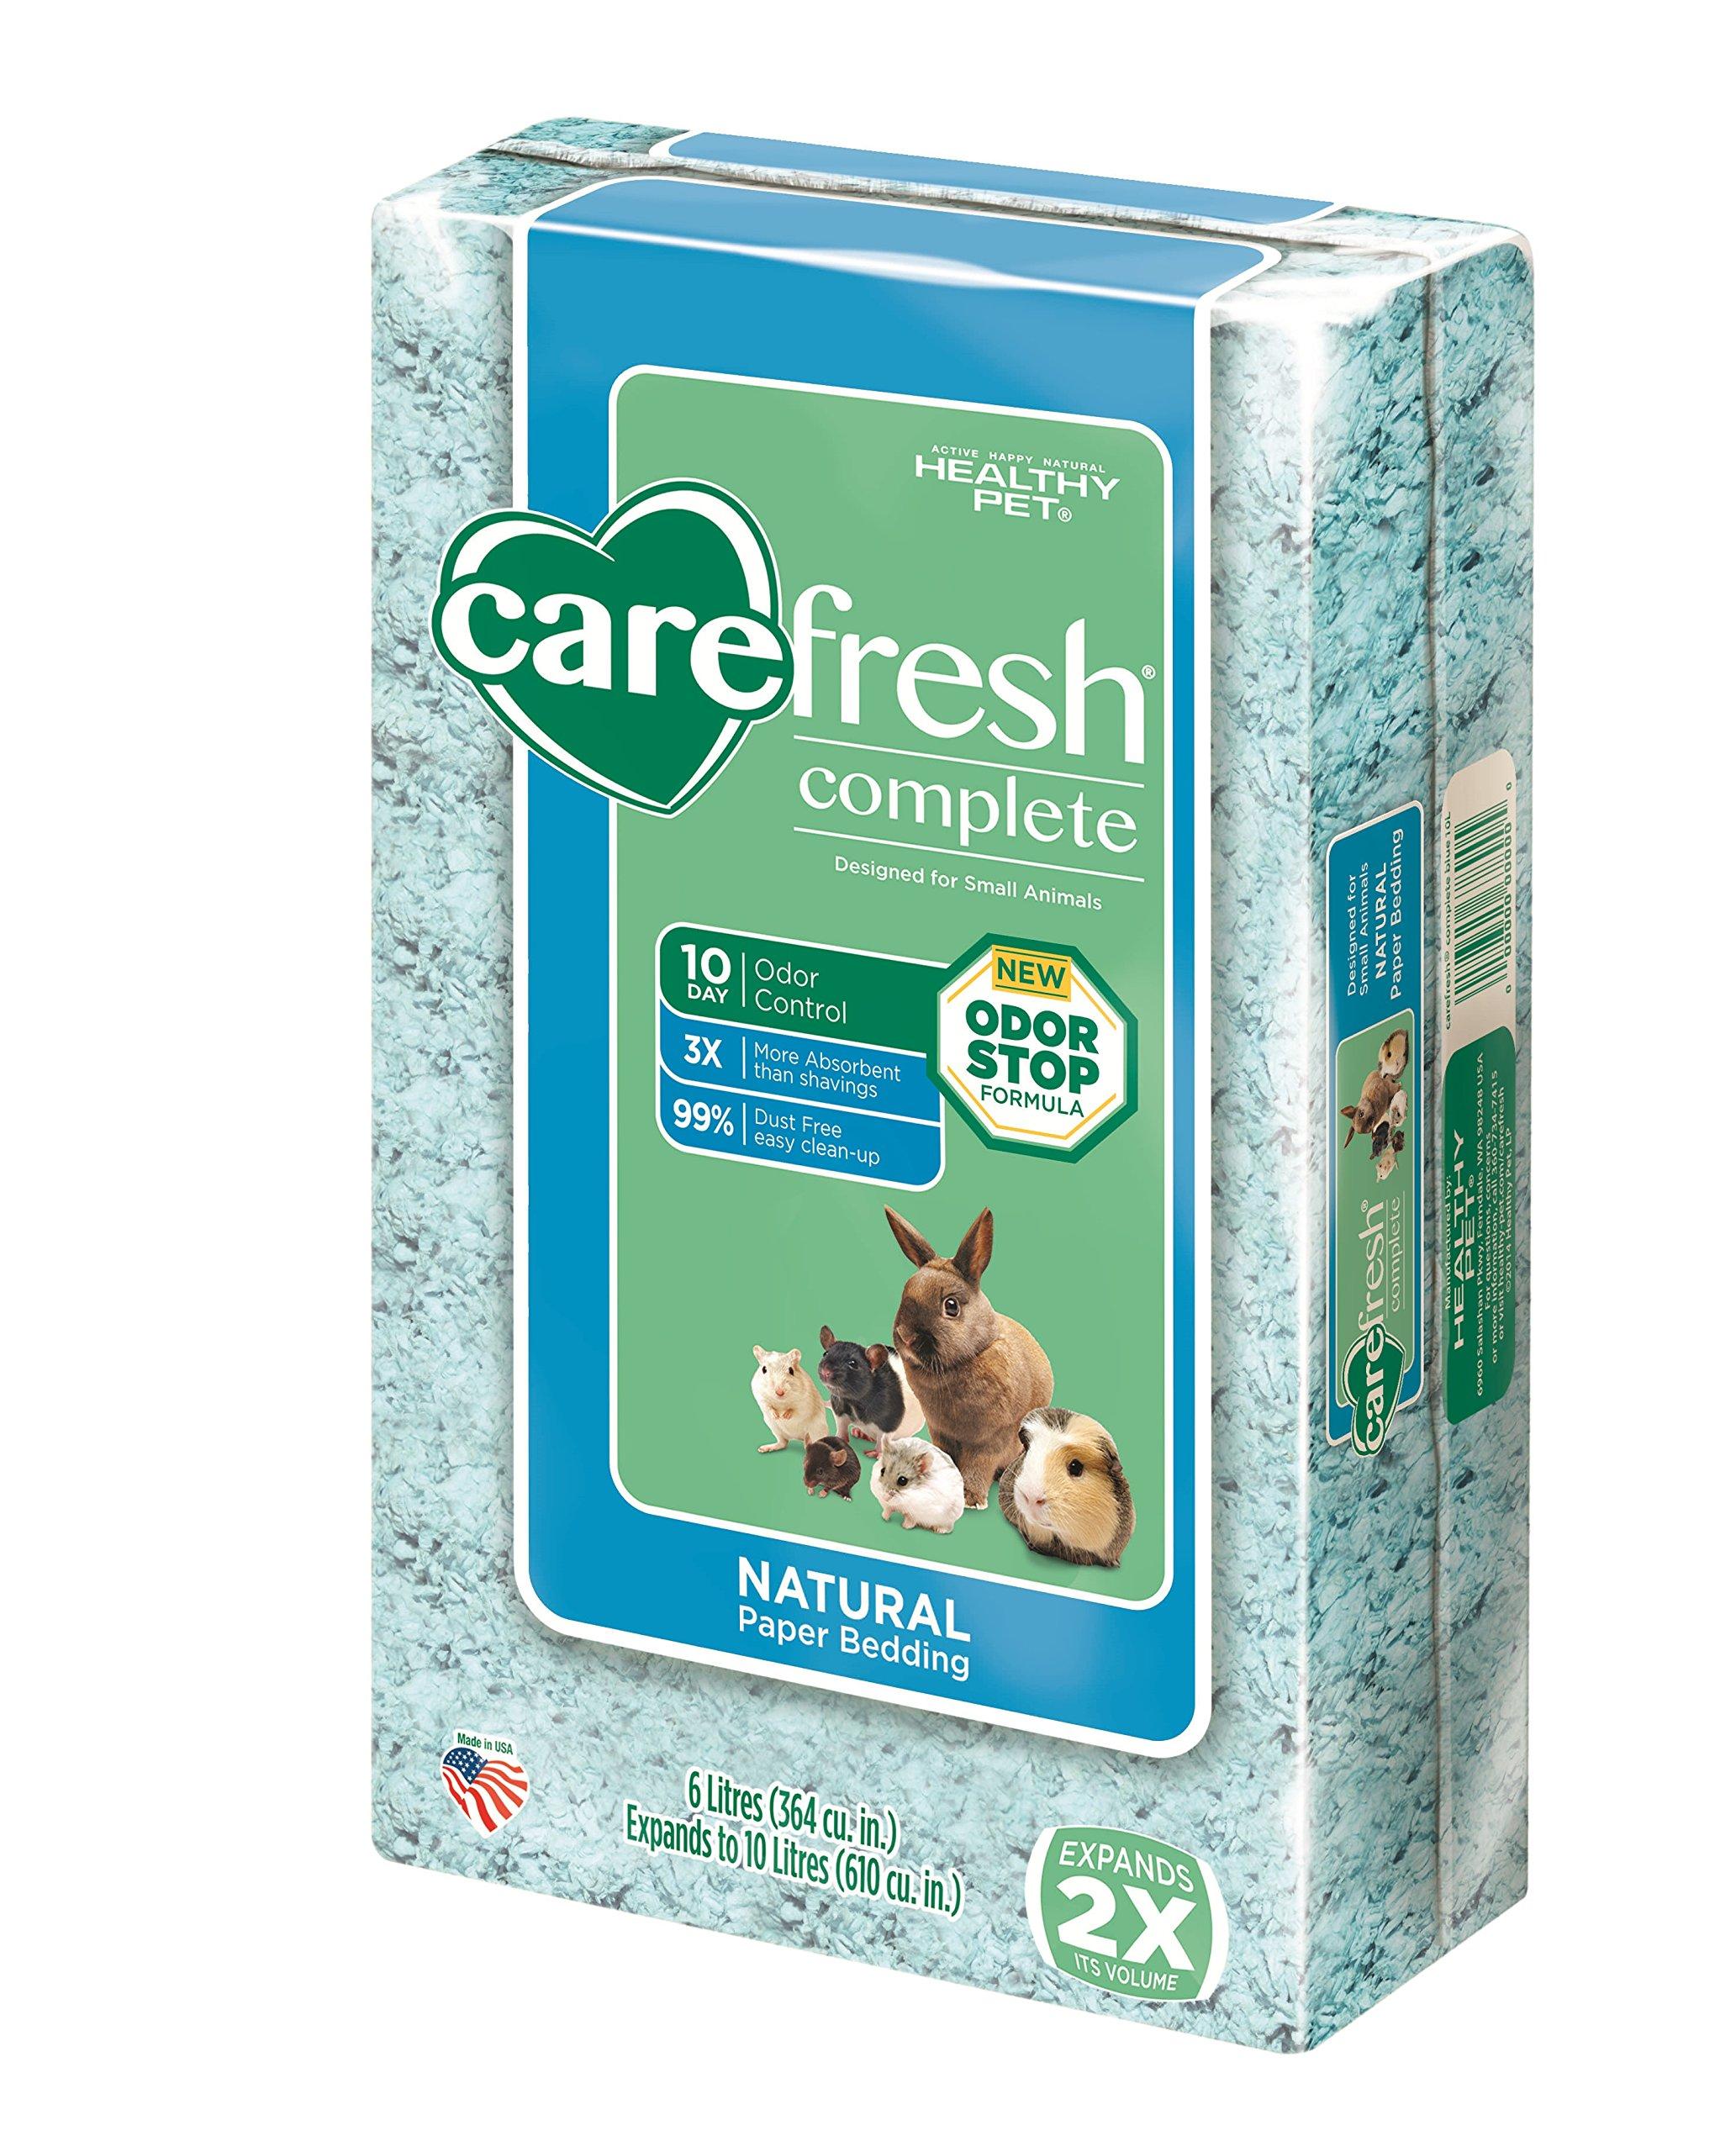 Absorption Corp Carefresh Pet Bedding, Blue, 10-Liter